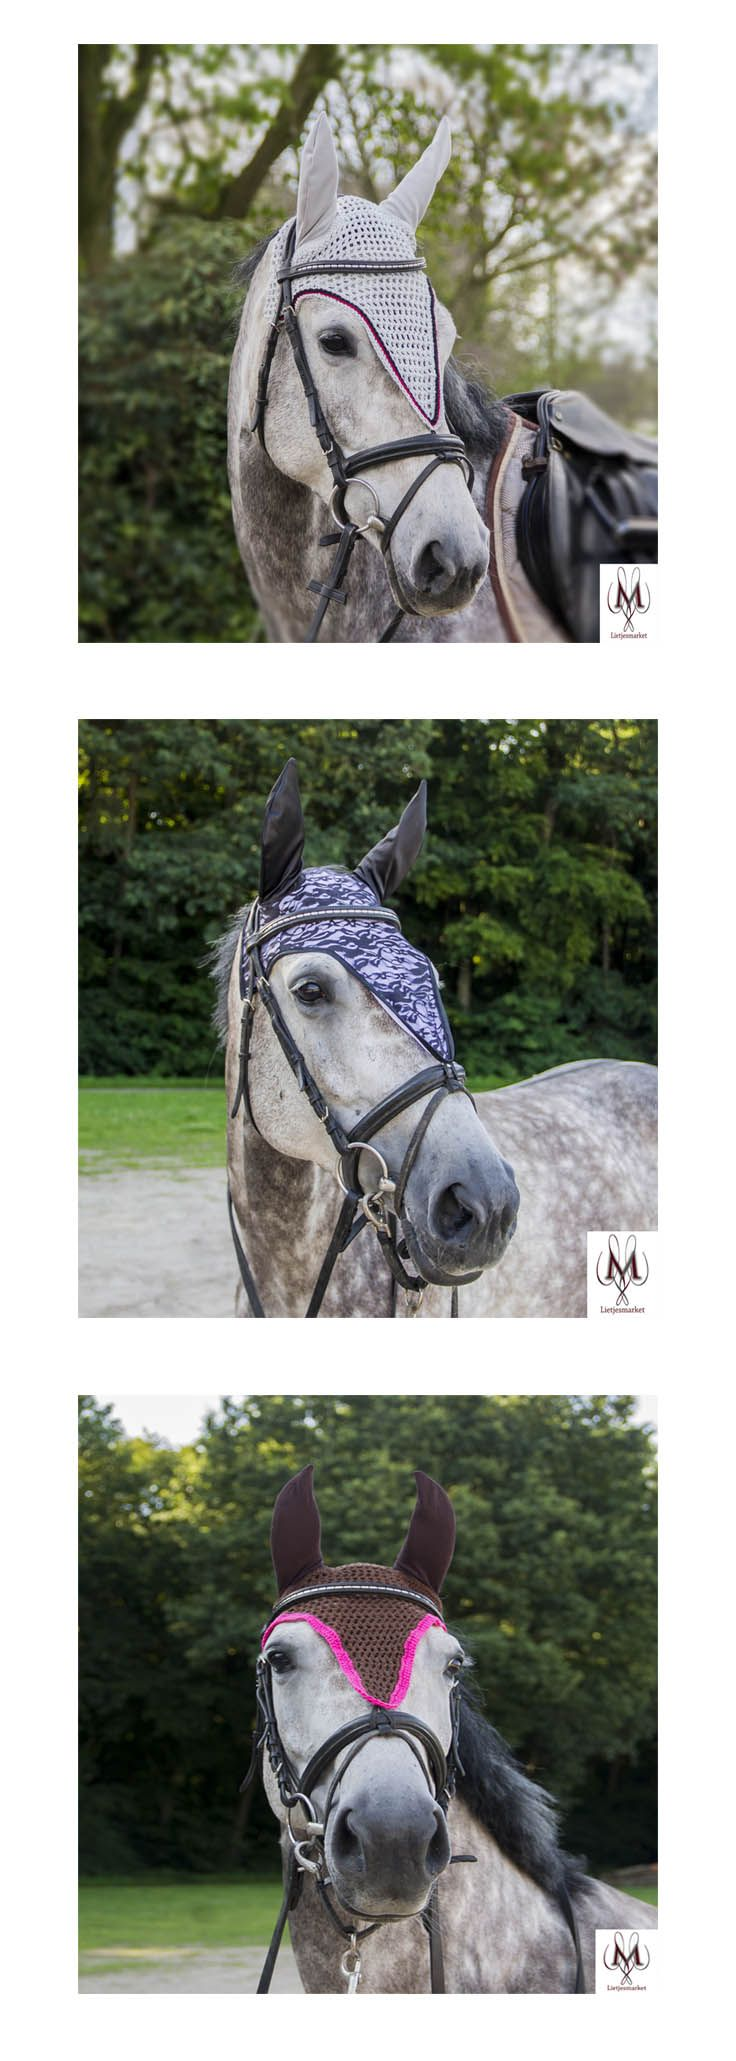 Fly bonnets, fly bonnet horse, long fly veil, long model ear bonnet, dressage horse, horse fashion, horse photografy, beautifull horses, equine fashion, showjumping